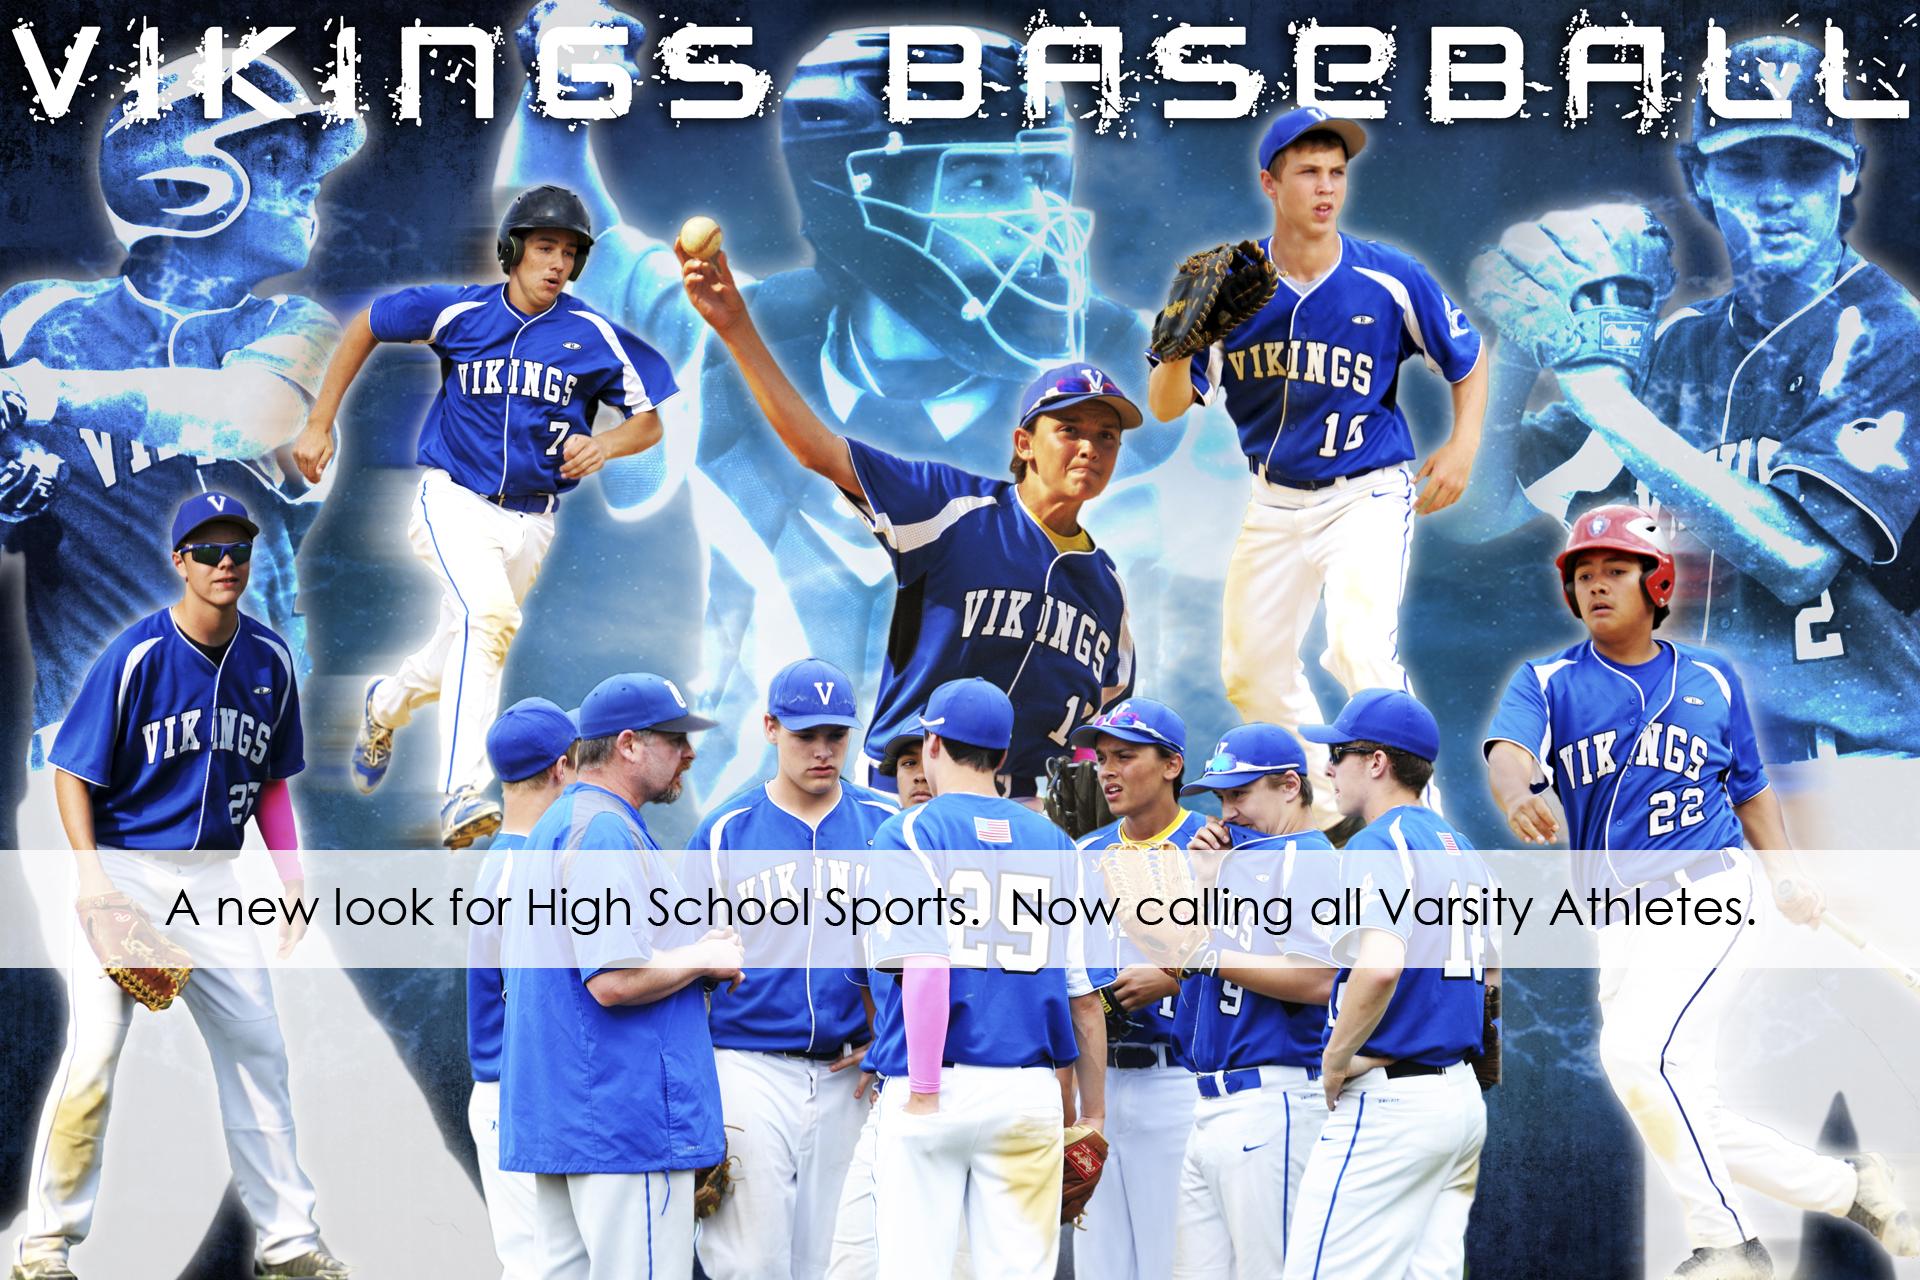 VC baseball poster styled